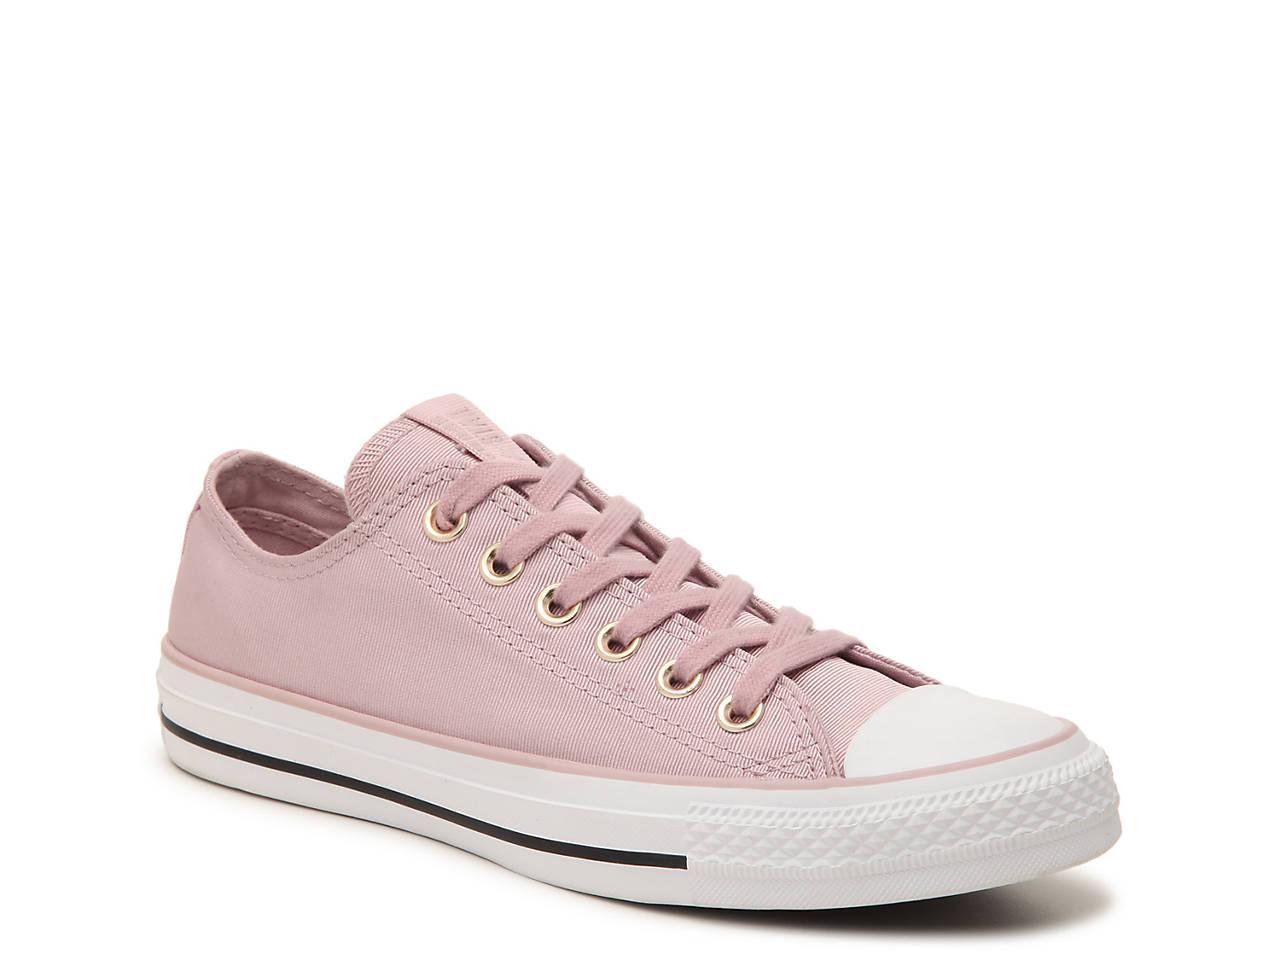 ae4ad970b8f27a Converse Chuck Taylor All Star Sneaker - Women s Women s Shoes